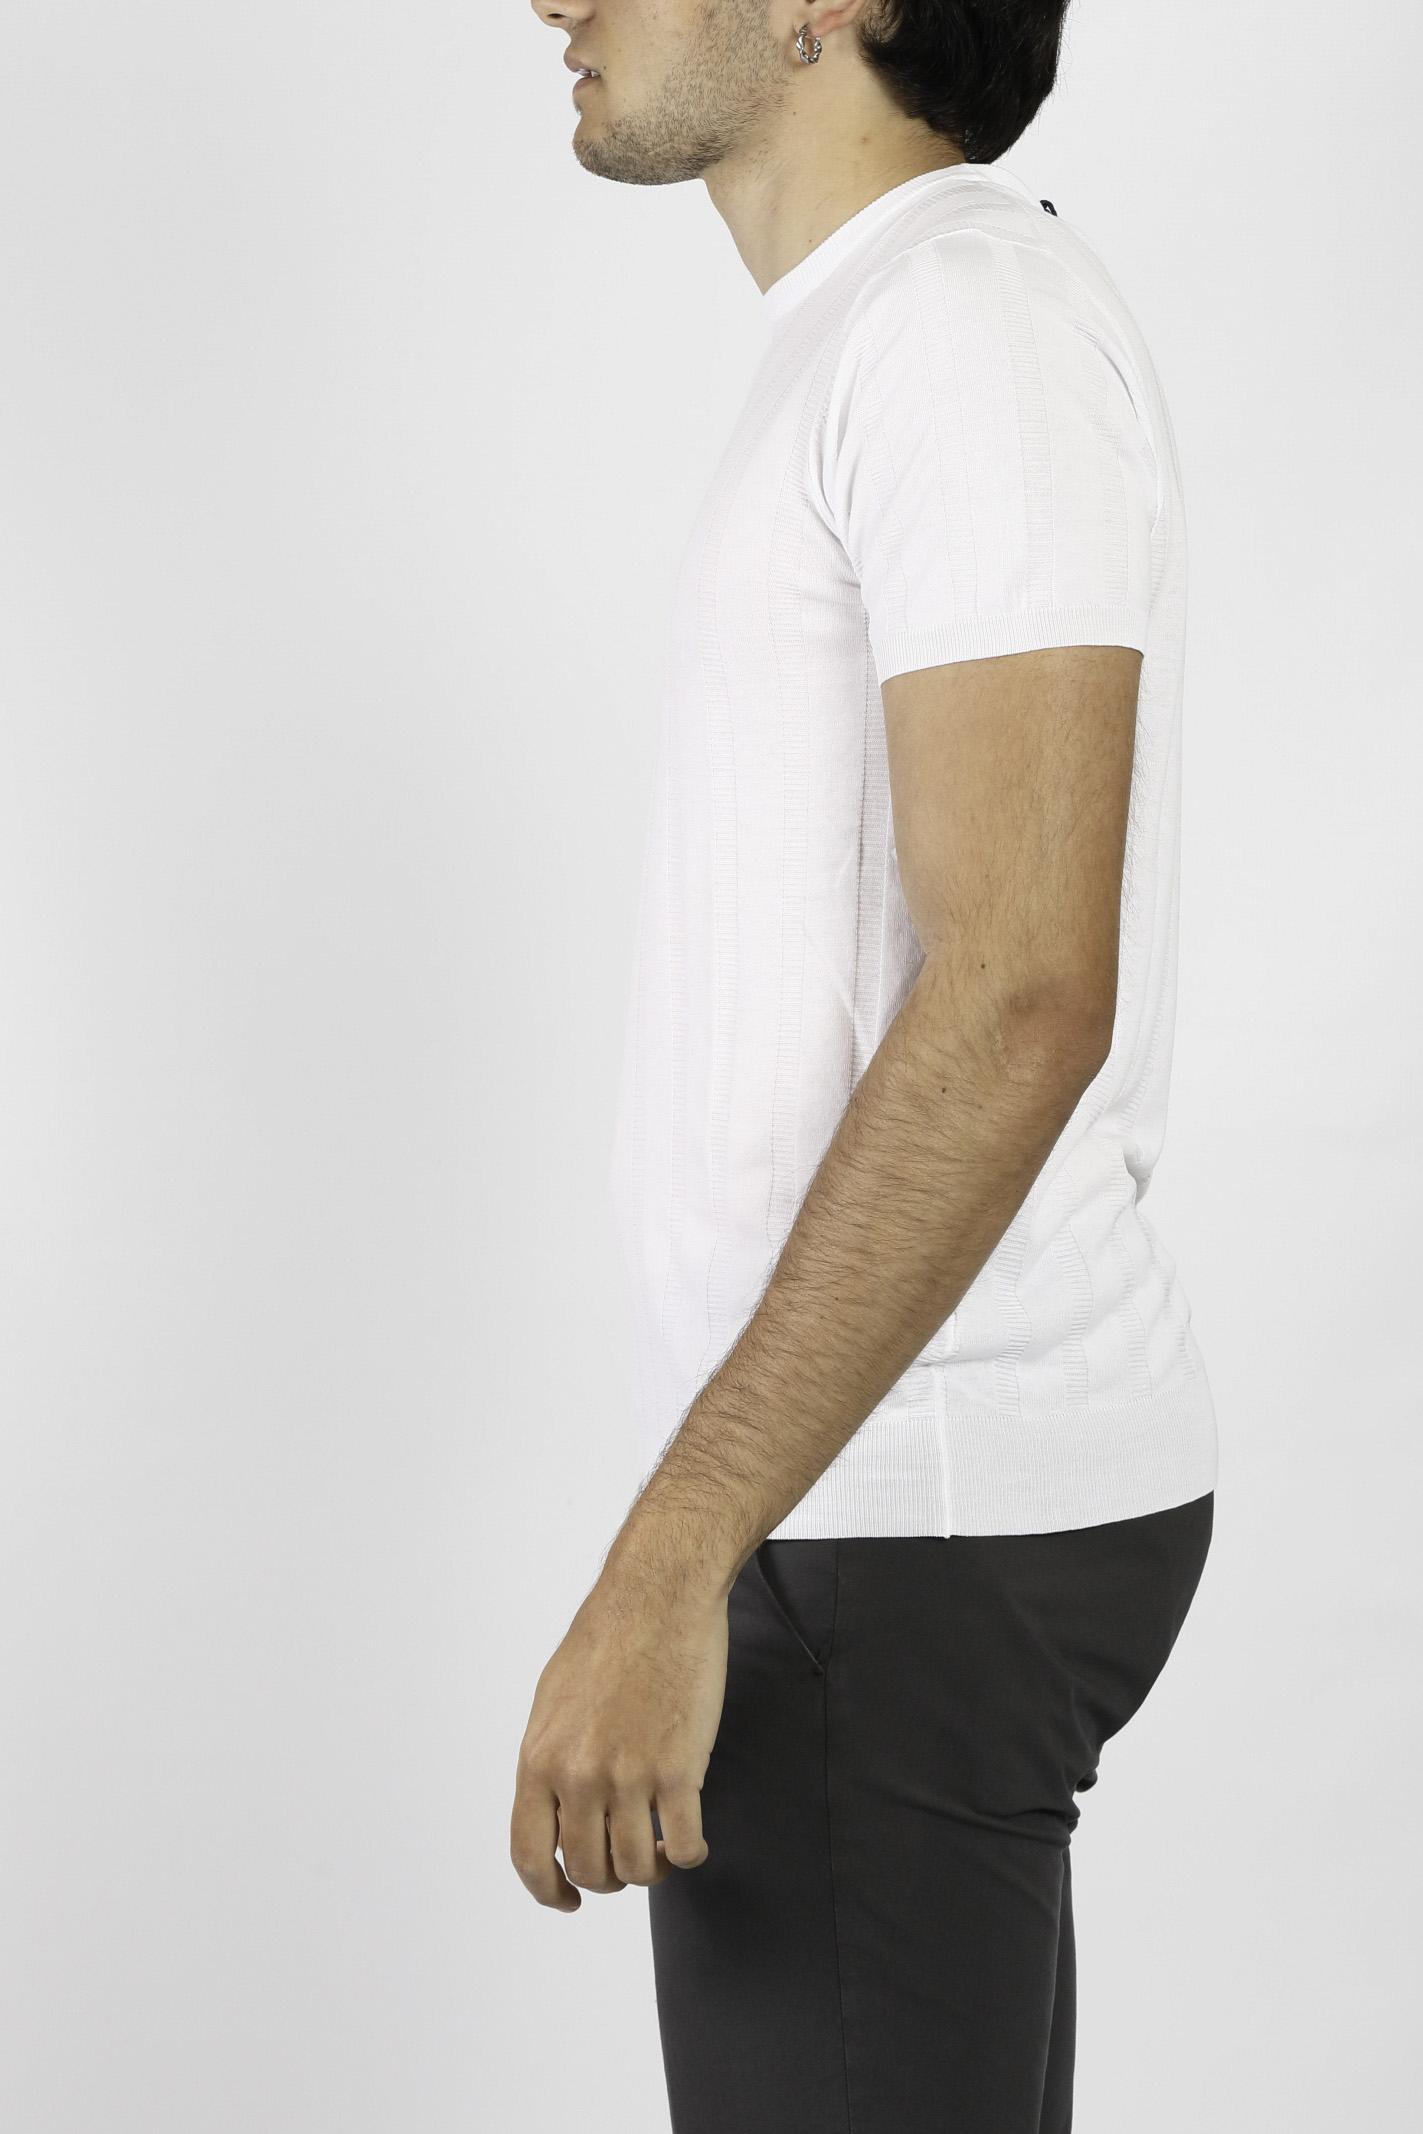 T-SHIRT JEORDIE'S | T-shirt | 75502100